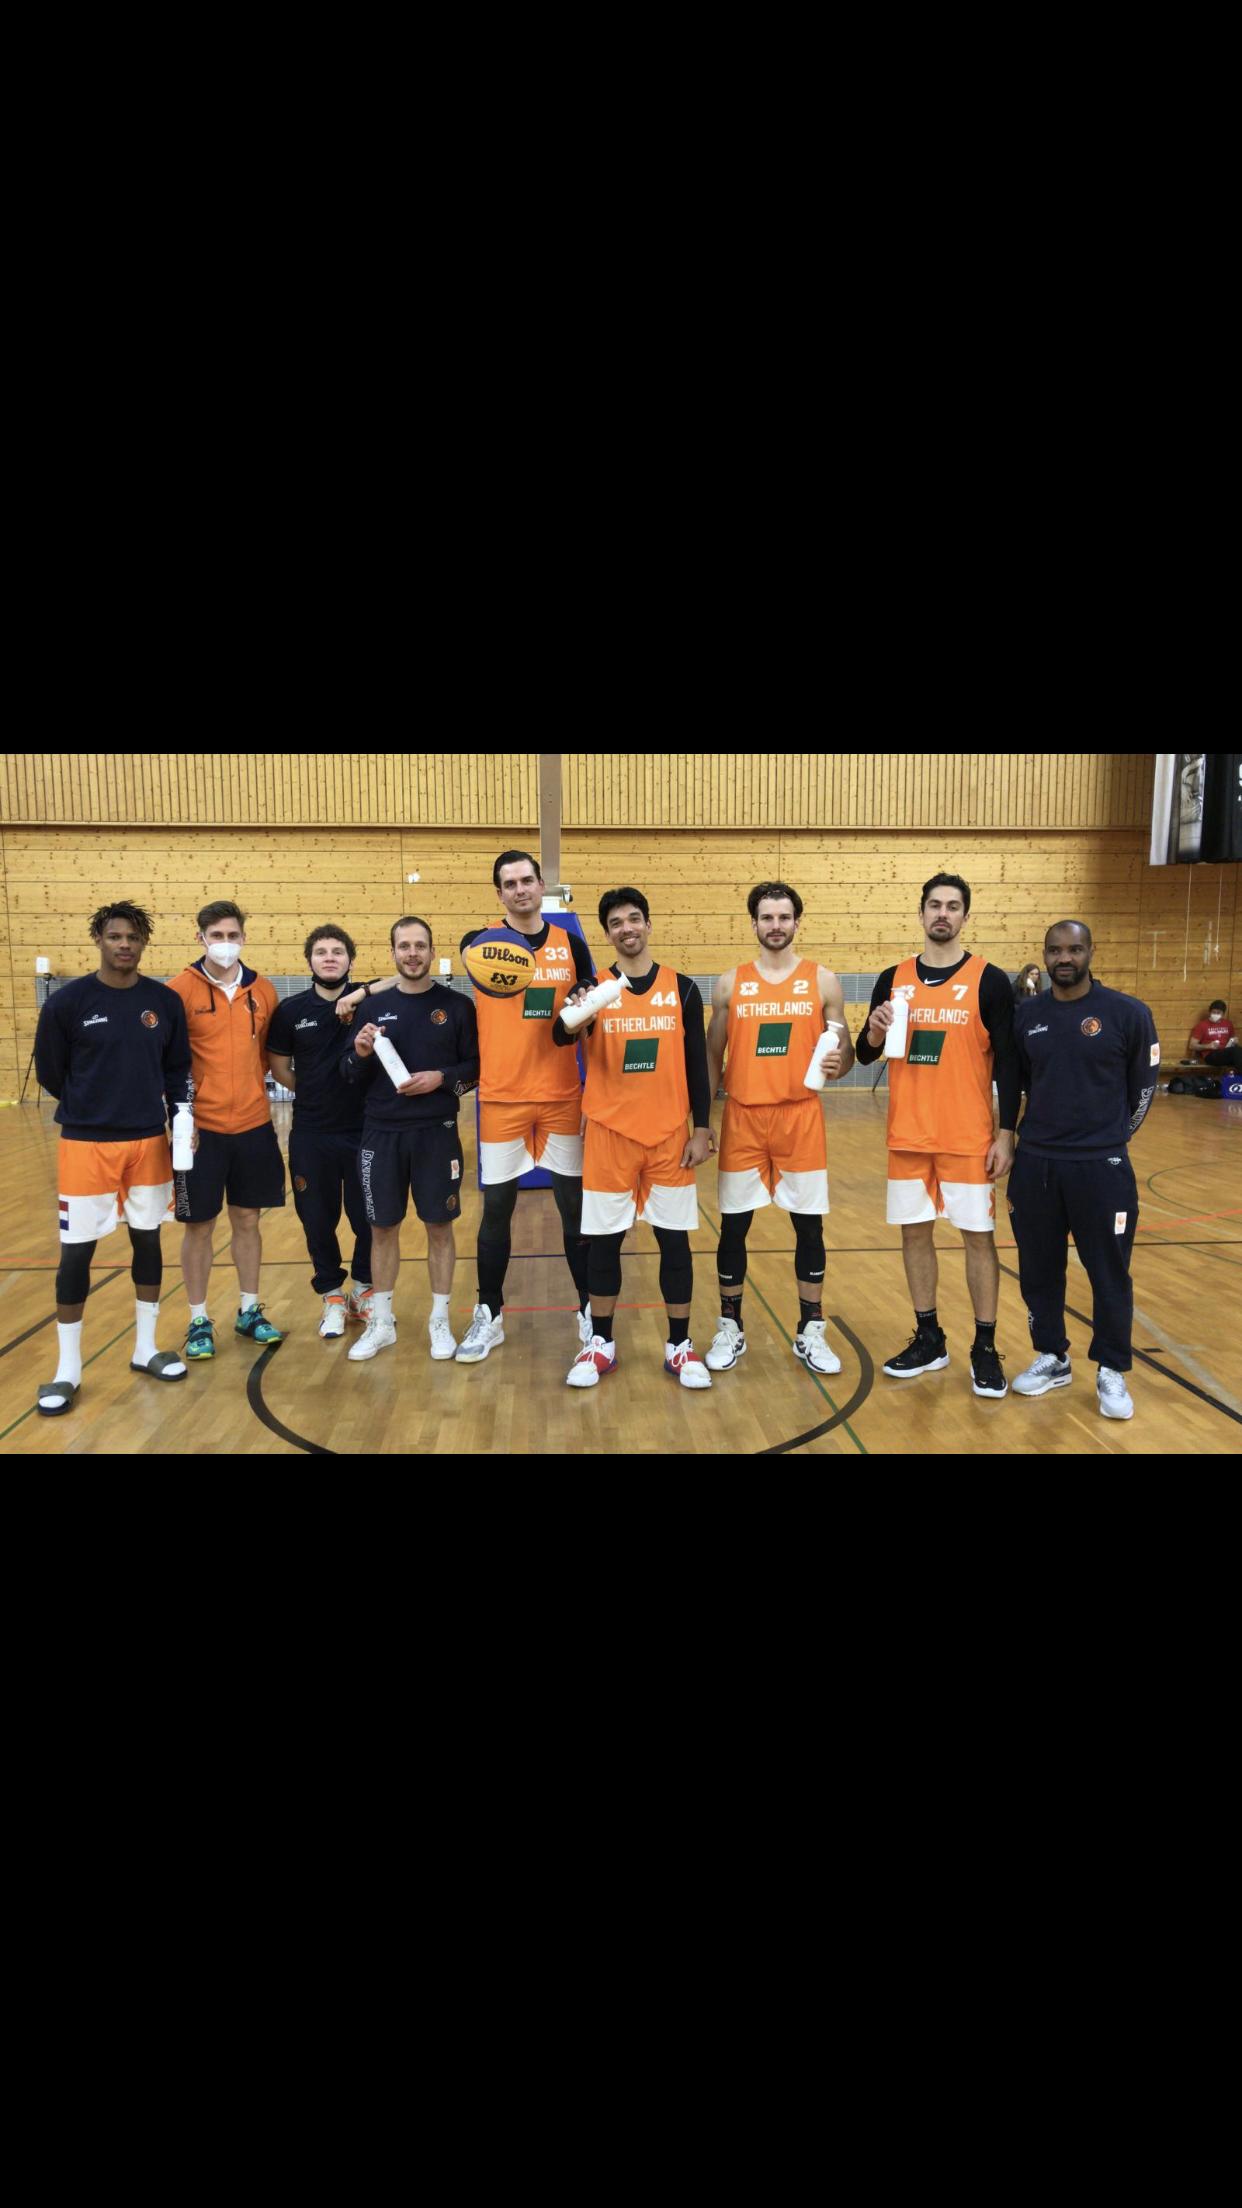 Team Amsterdam